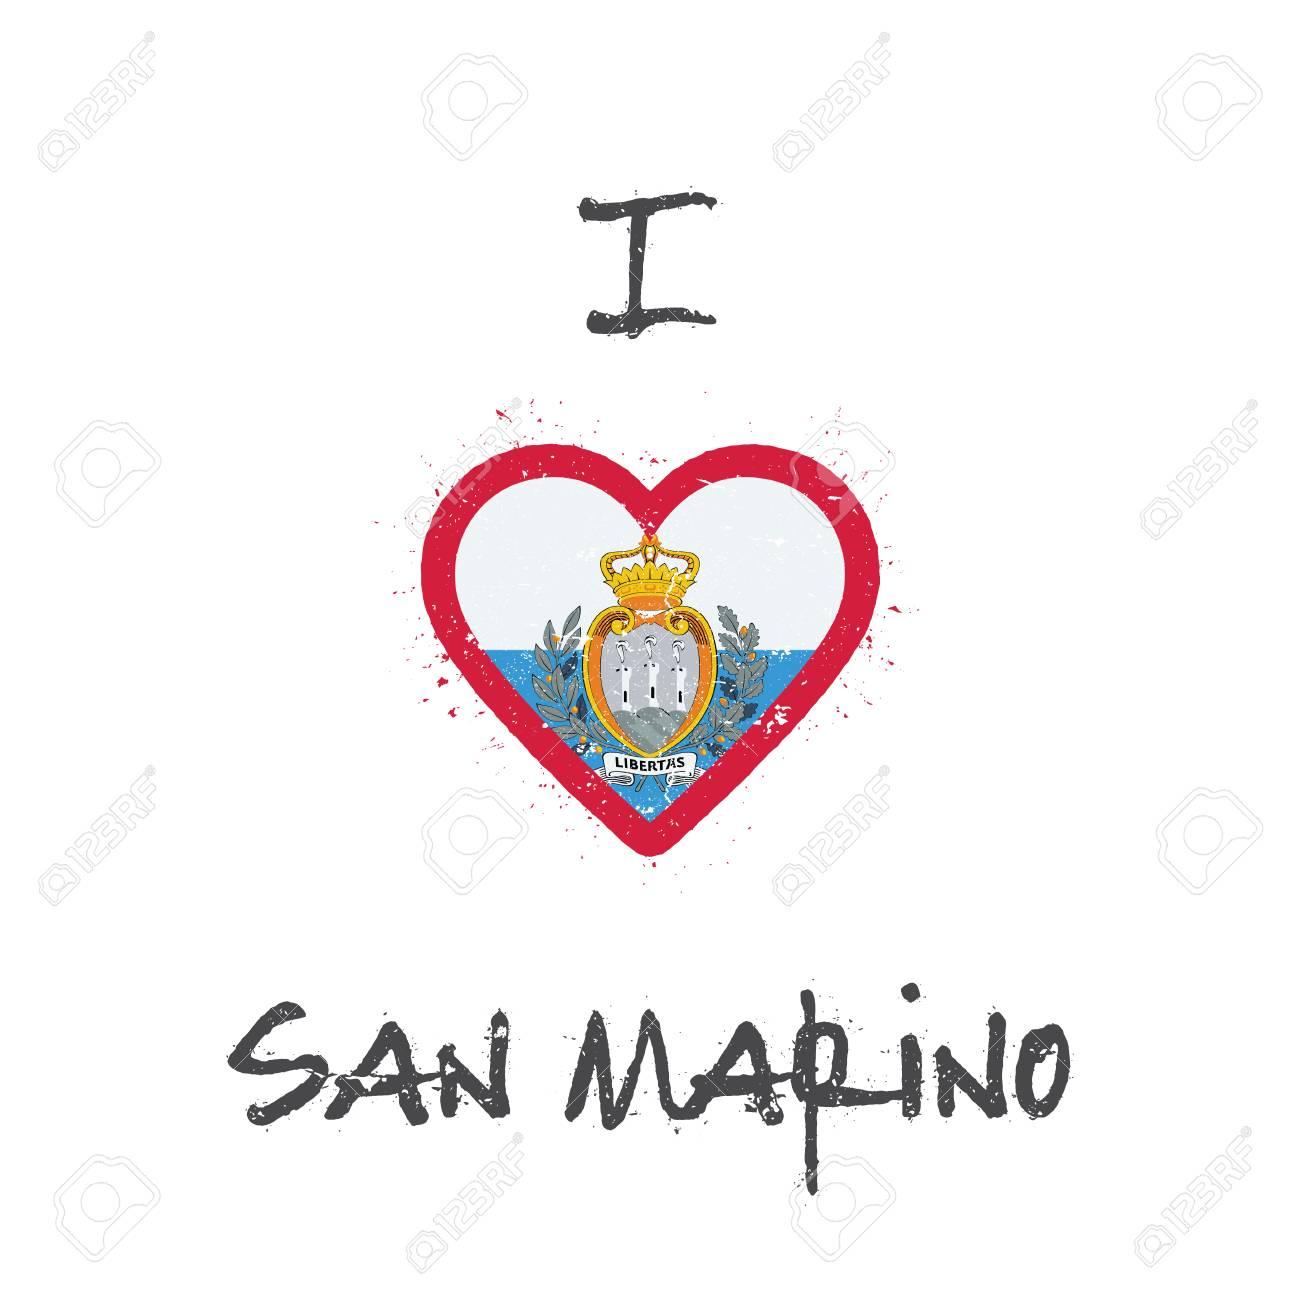 https://previews.123rf.com/images/gagarych/gagarych1801/gagarych180100478/93133916-i-love-san-marino-t-shirt-design-sammarinese-flag-in-the-shape-of-heart-on-white-background-grunge-v.jpg